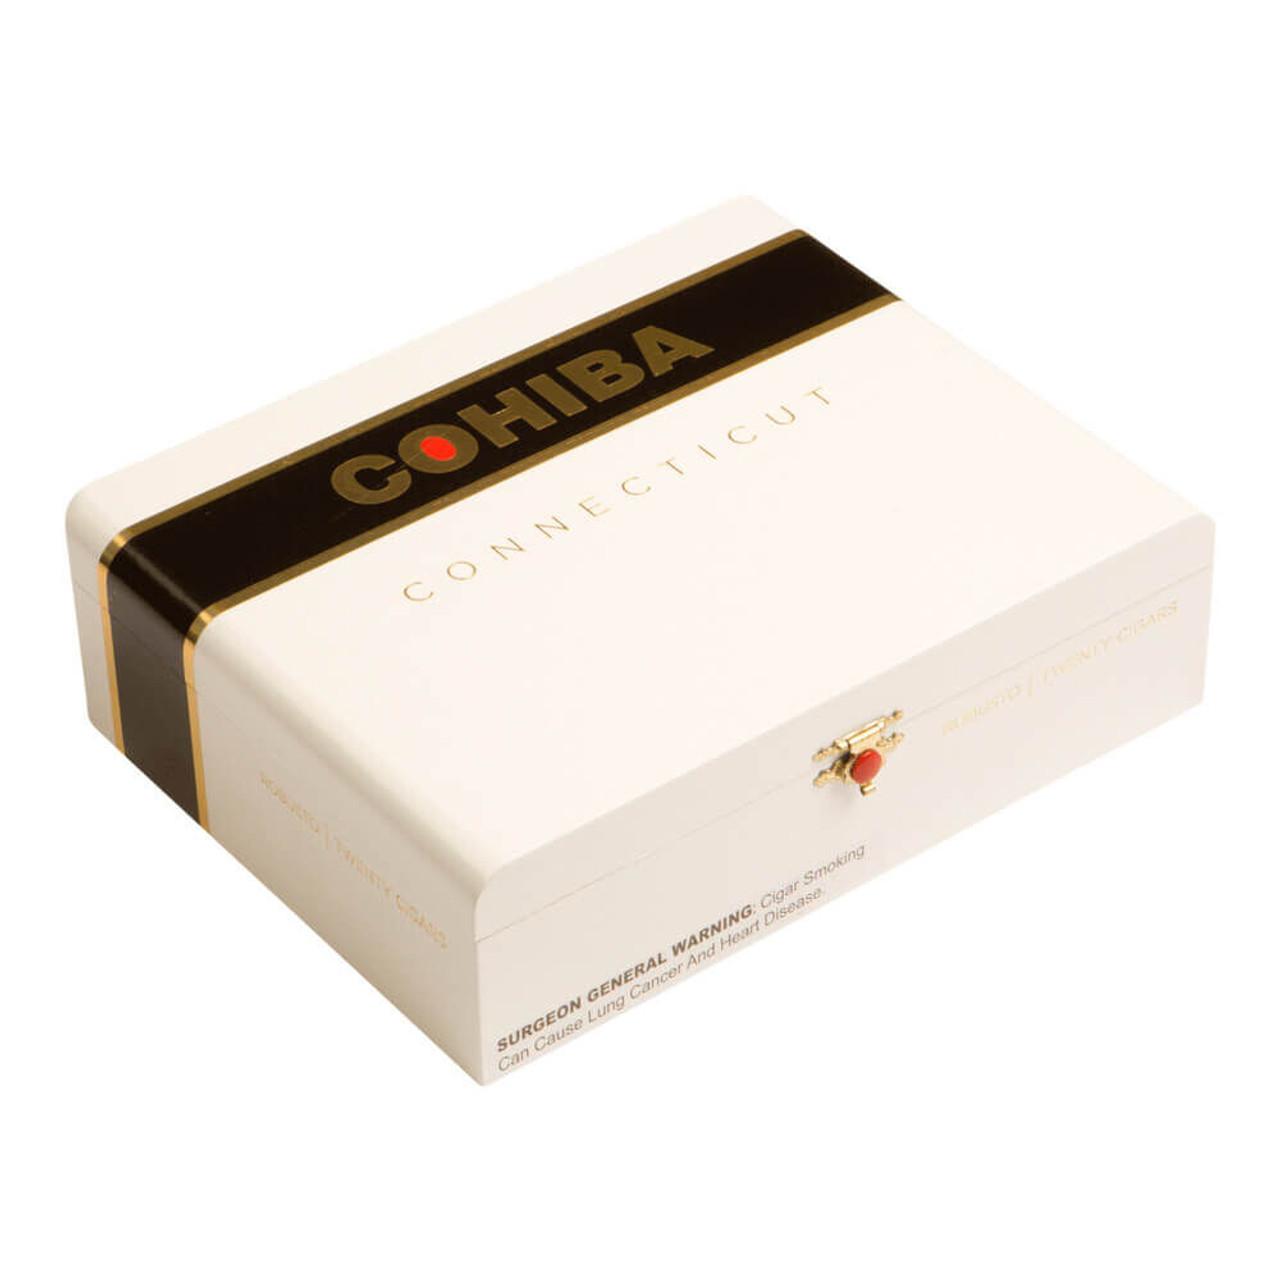 Cohiba Connecticut Robusto Cigars - 5.5 x 50 (Box of 20)